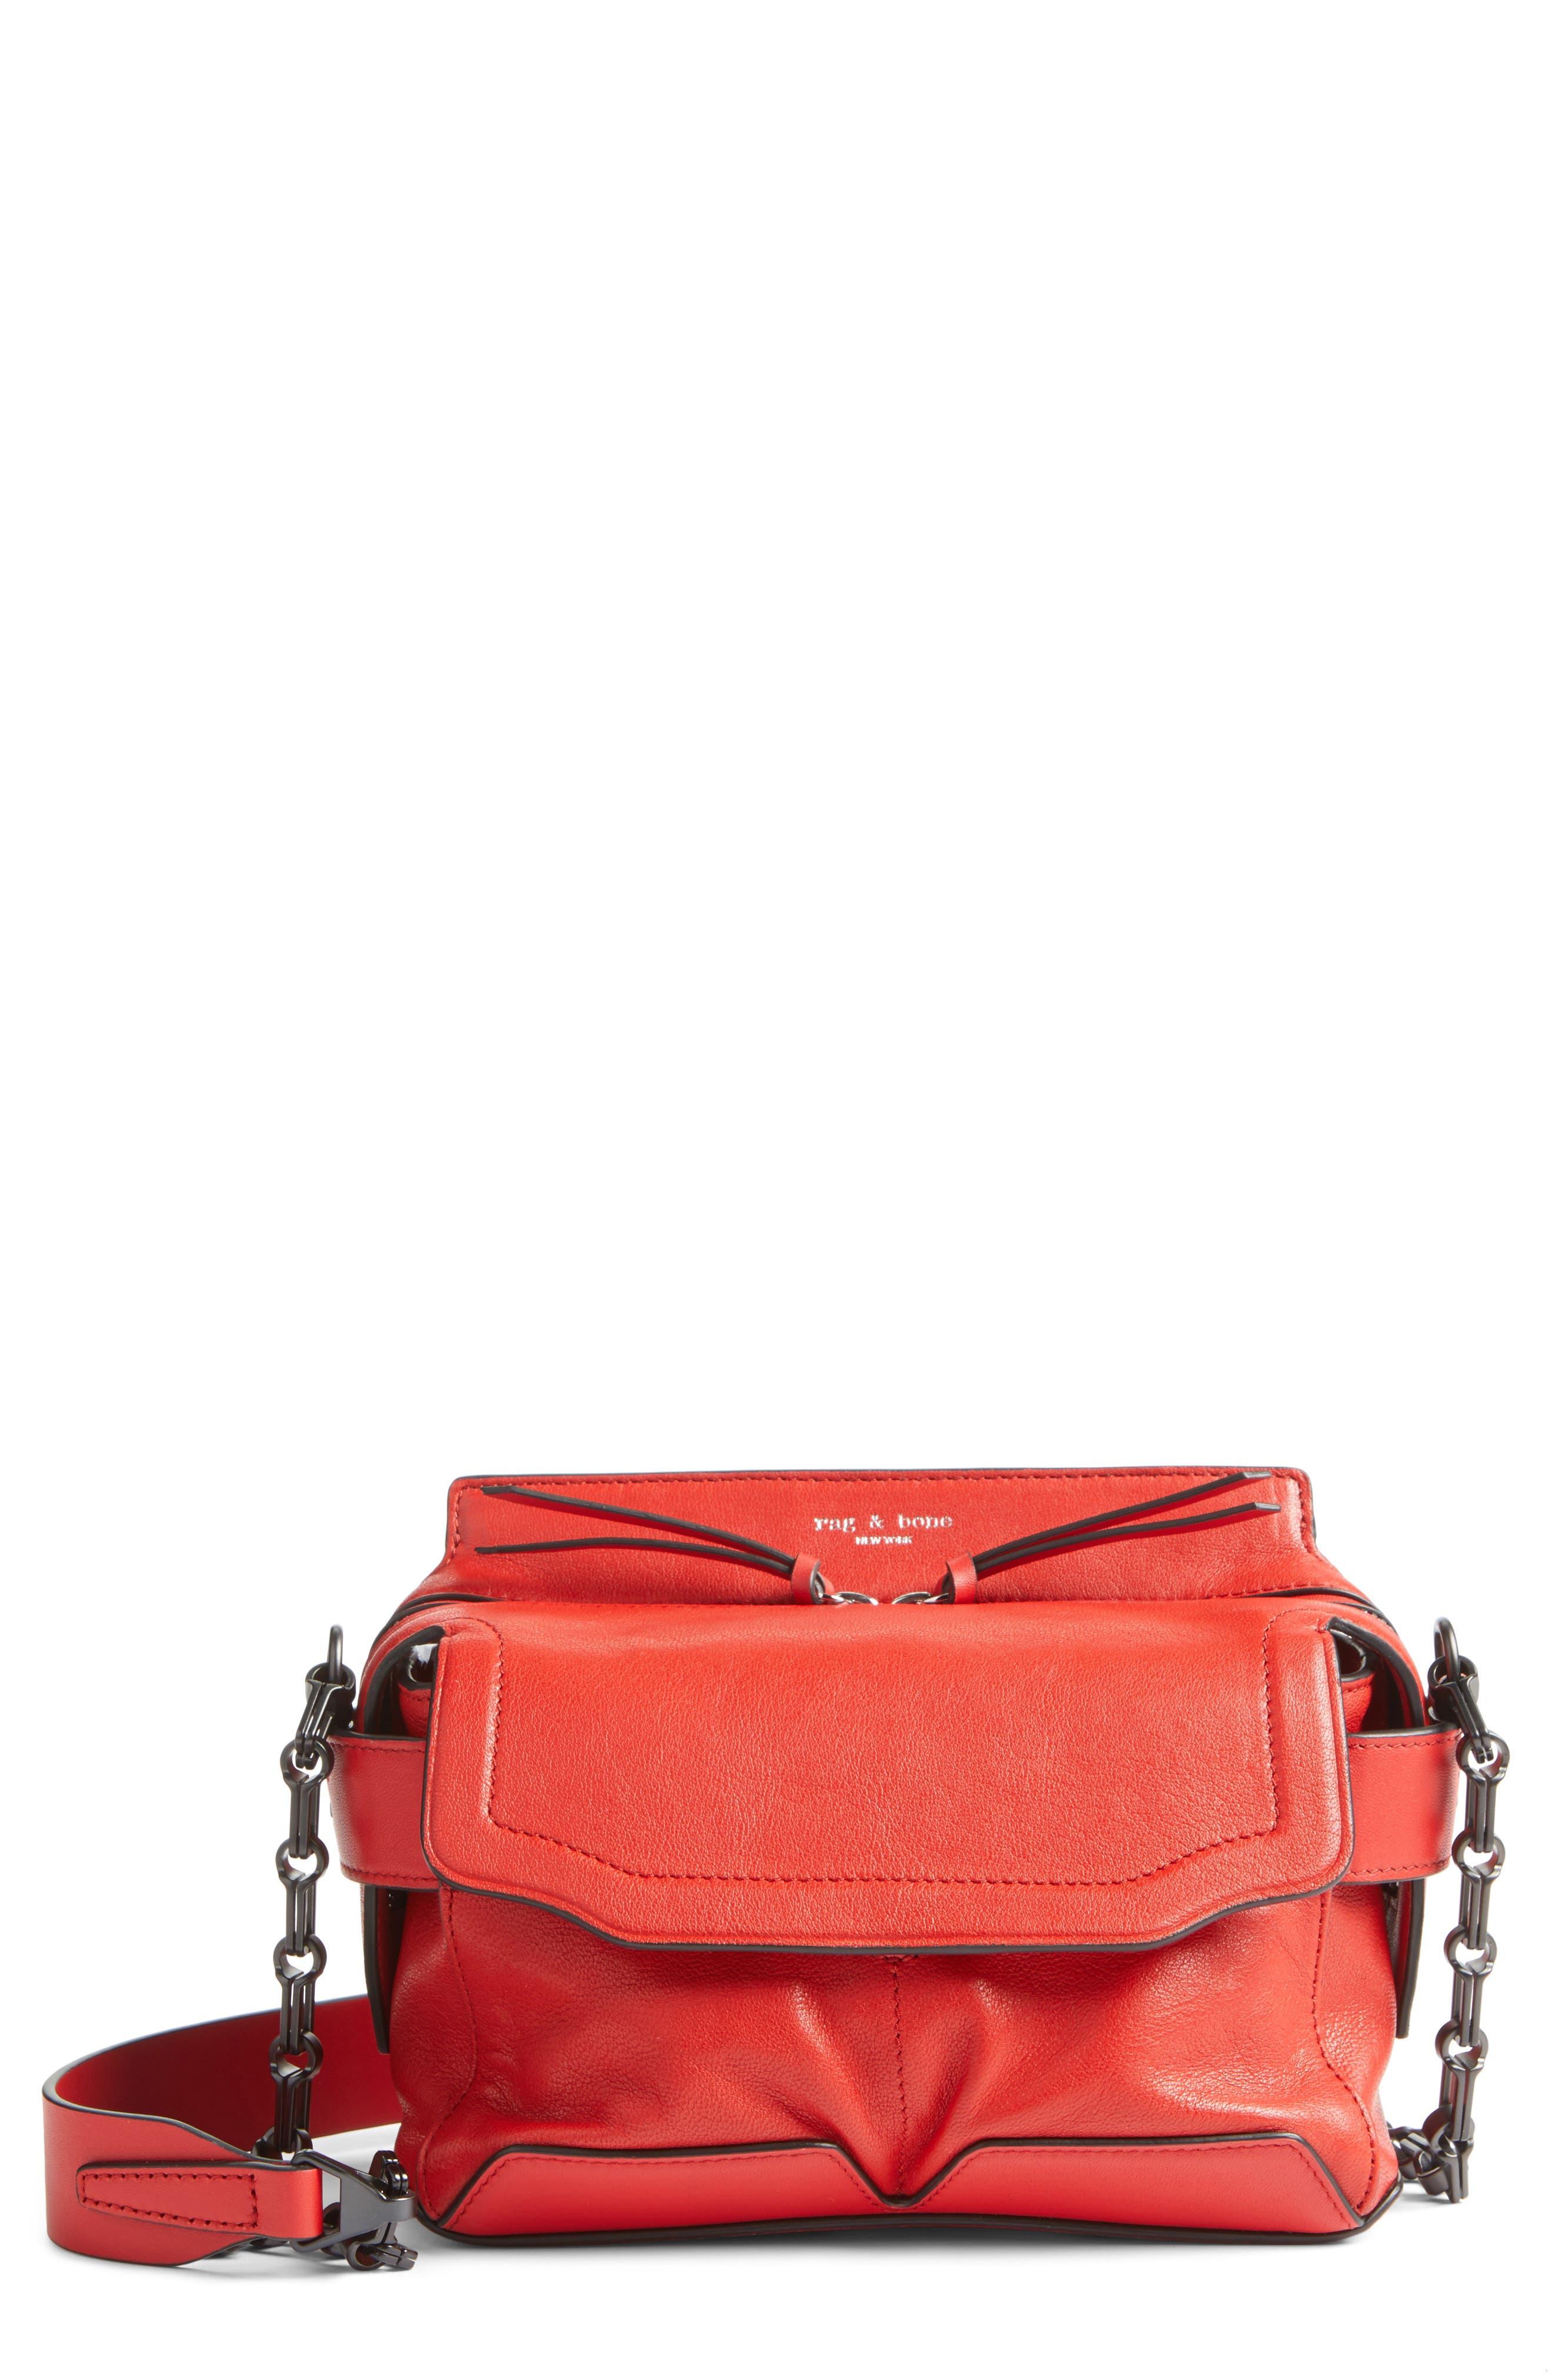 Micro Pilot Leather Satchel,                             Main thumbnail 1, color,                             Royal Red